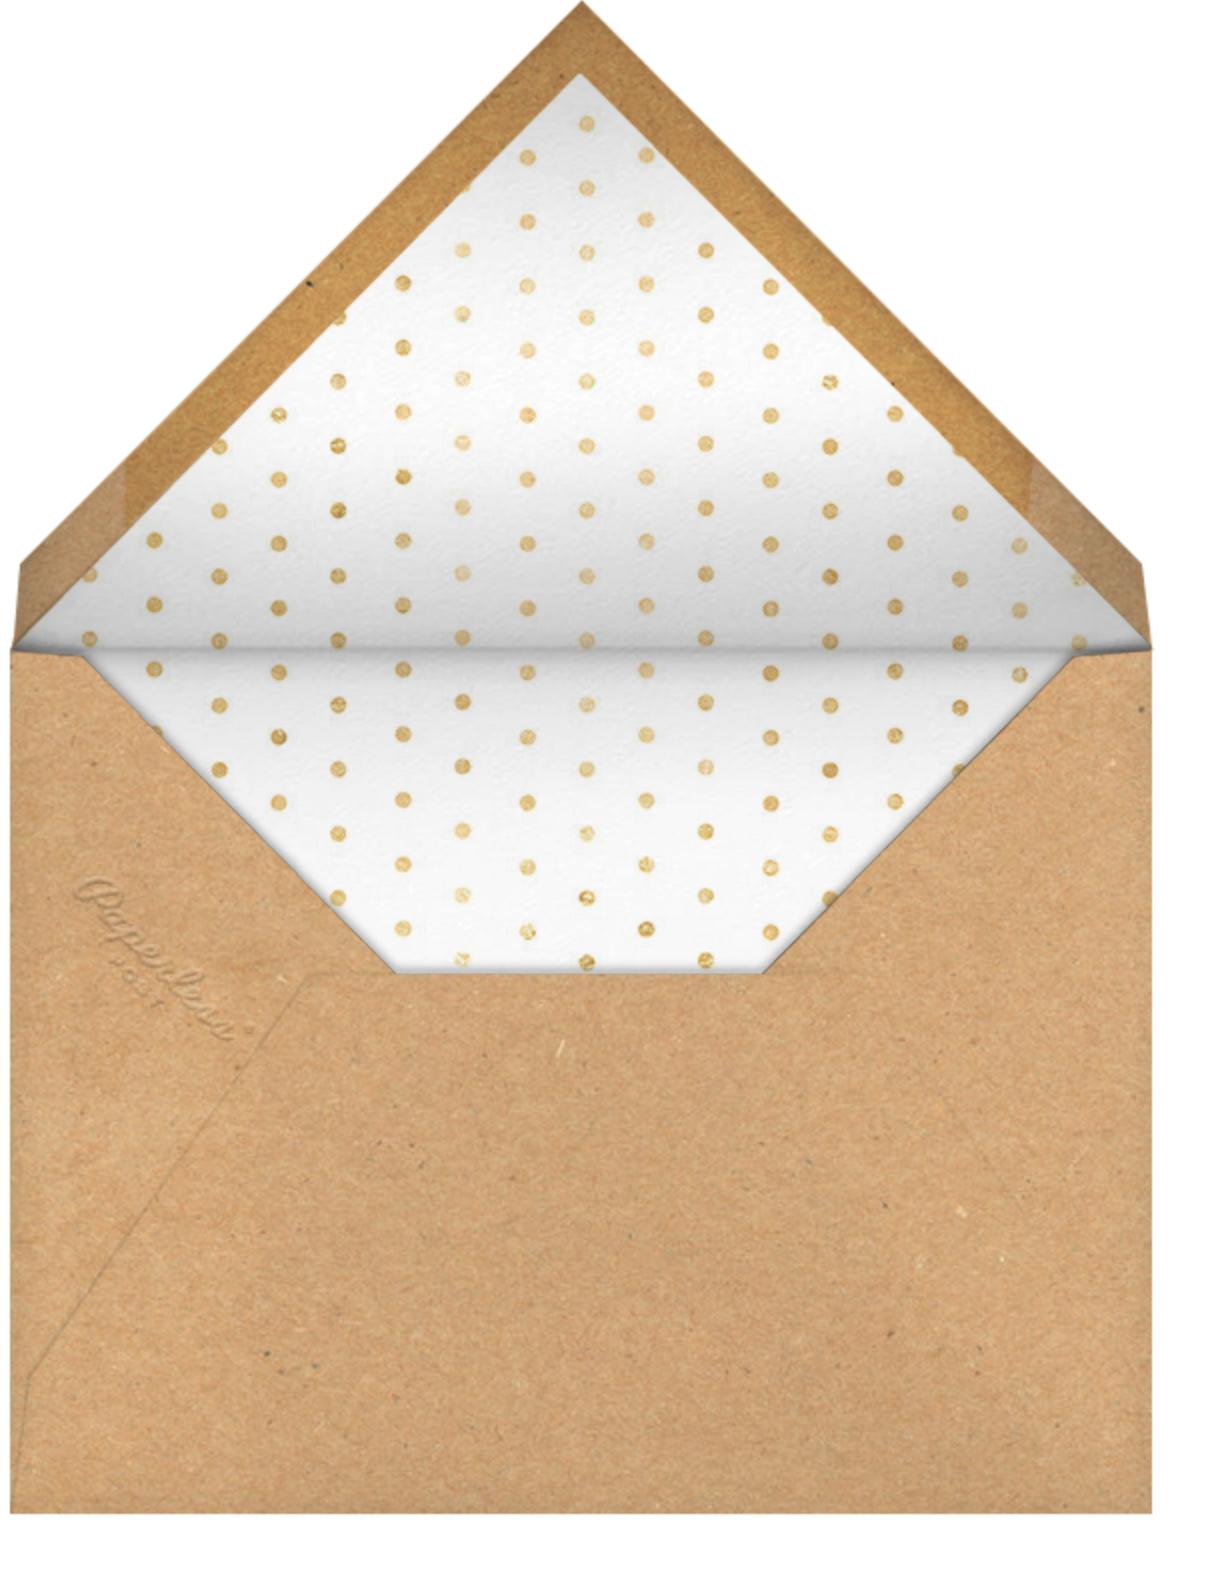 Dinner and Drinks - White - Sugar Paper - Dinner party - envelope back